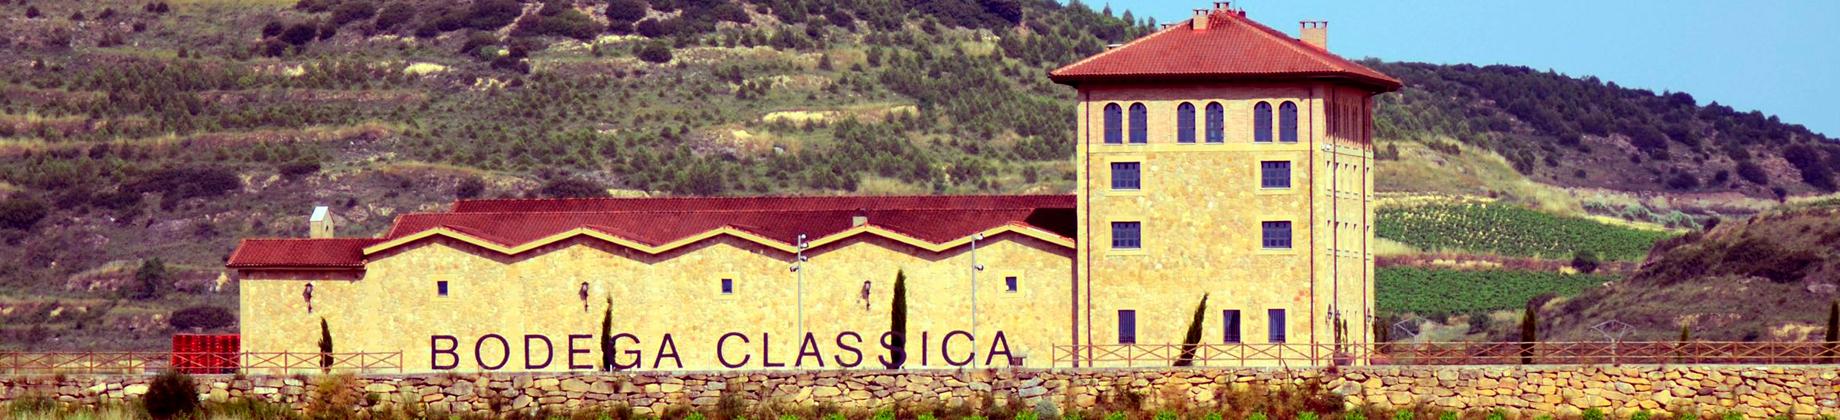 Bodega Classica